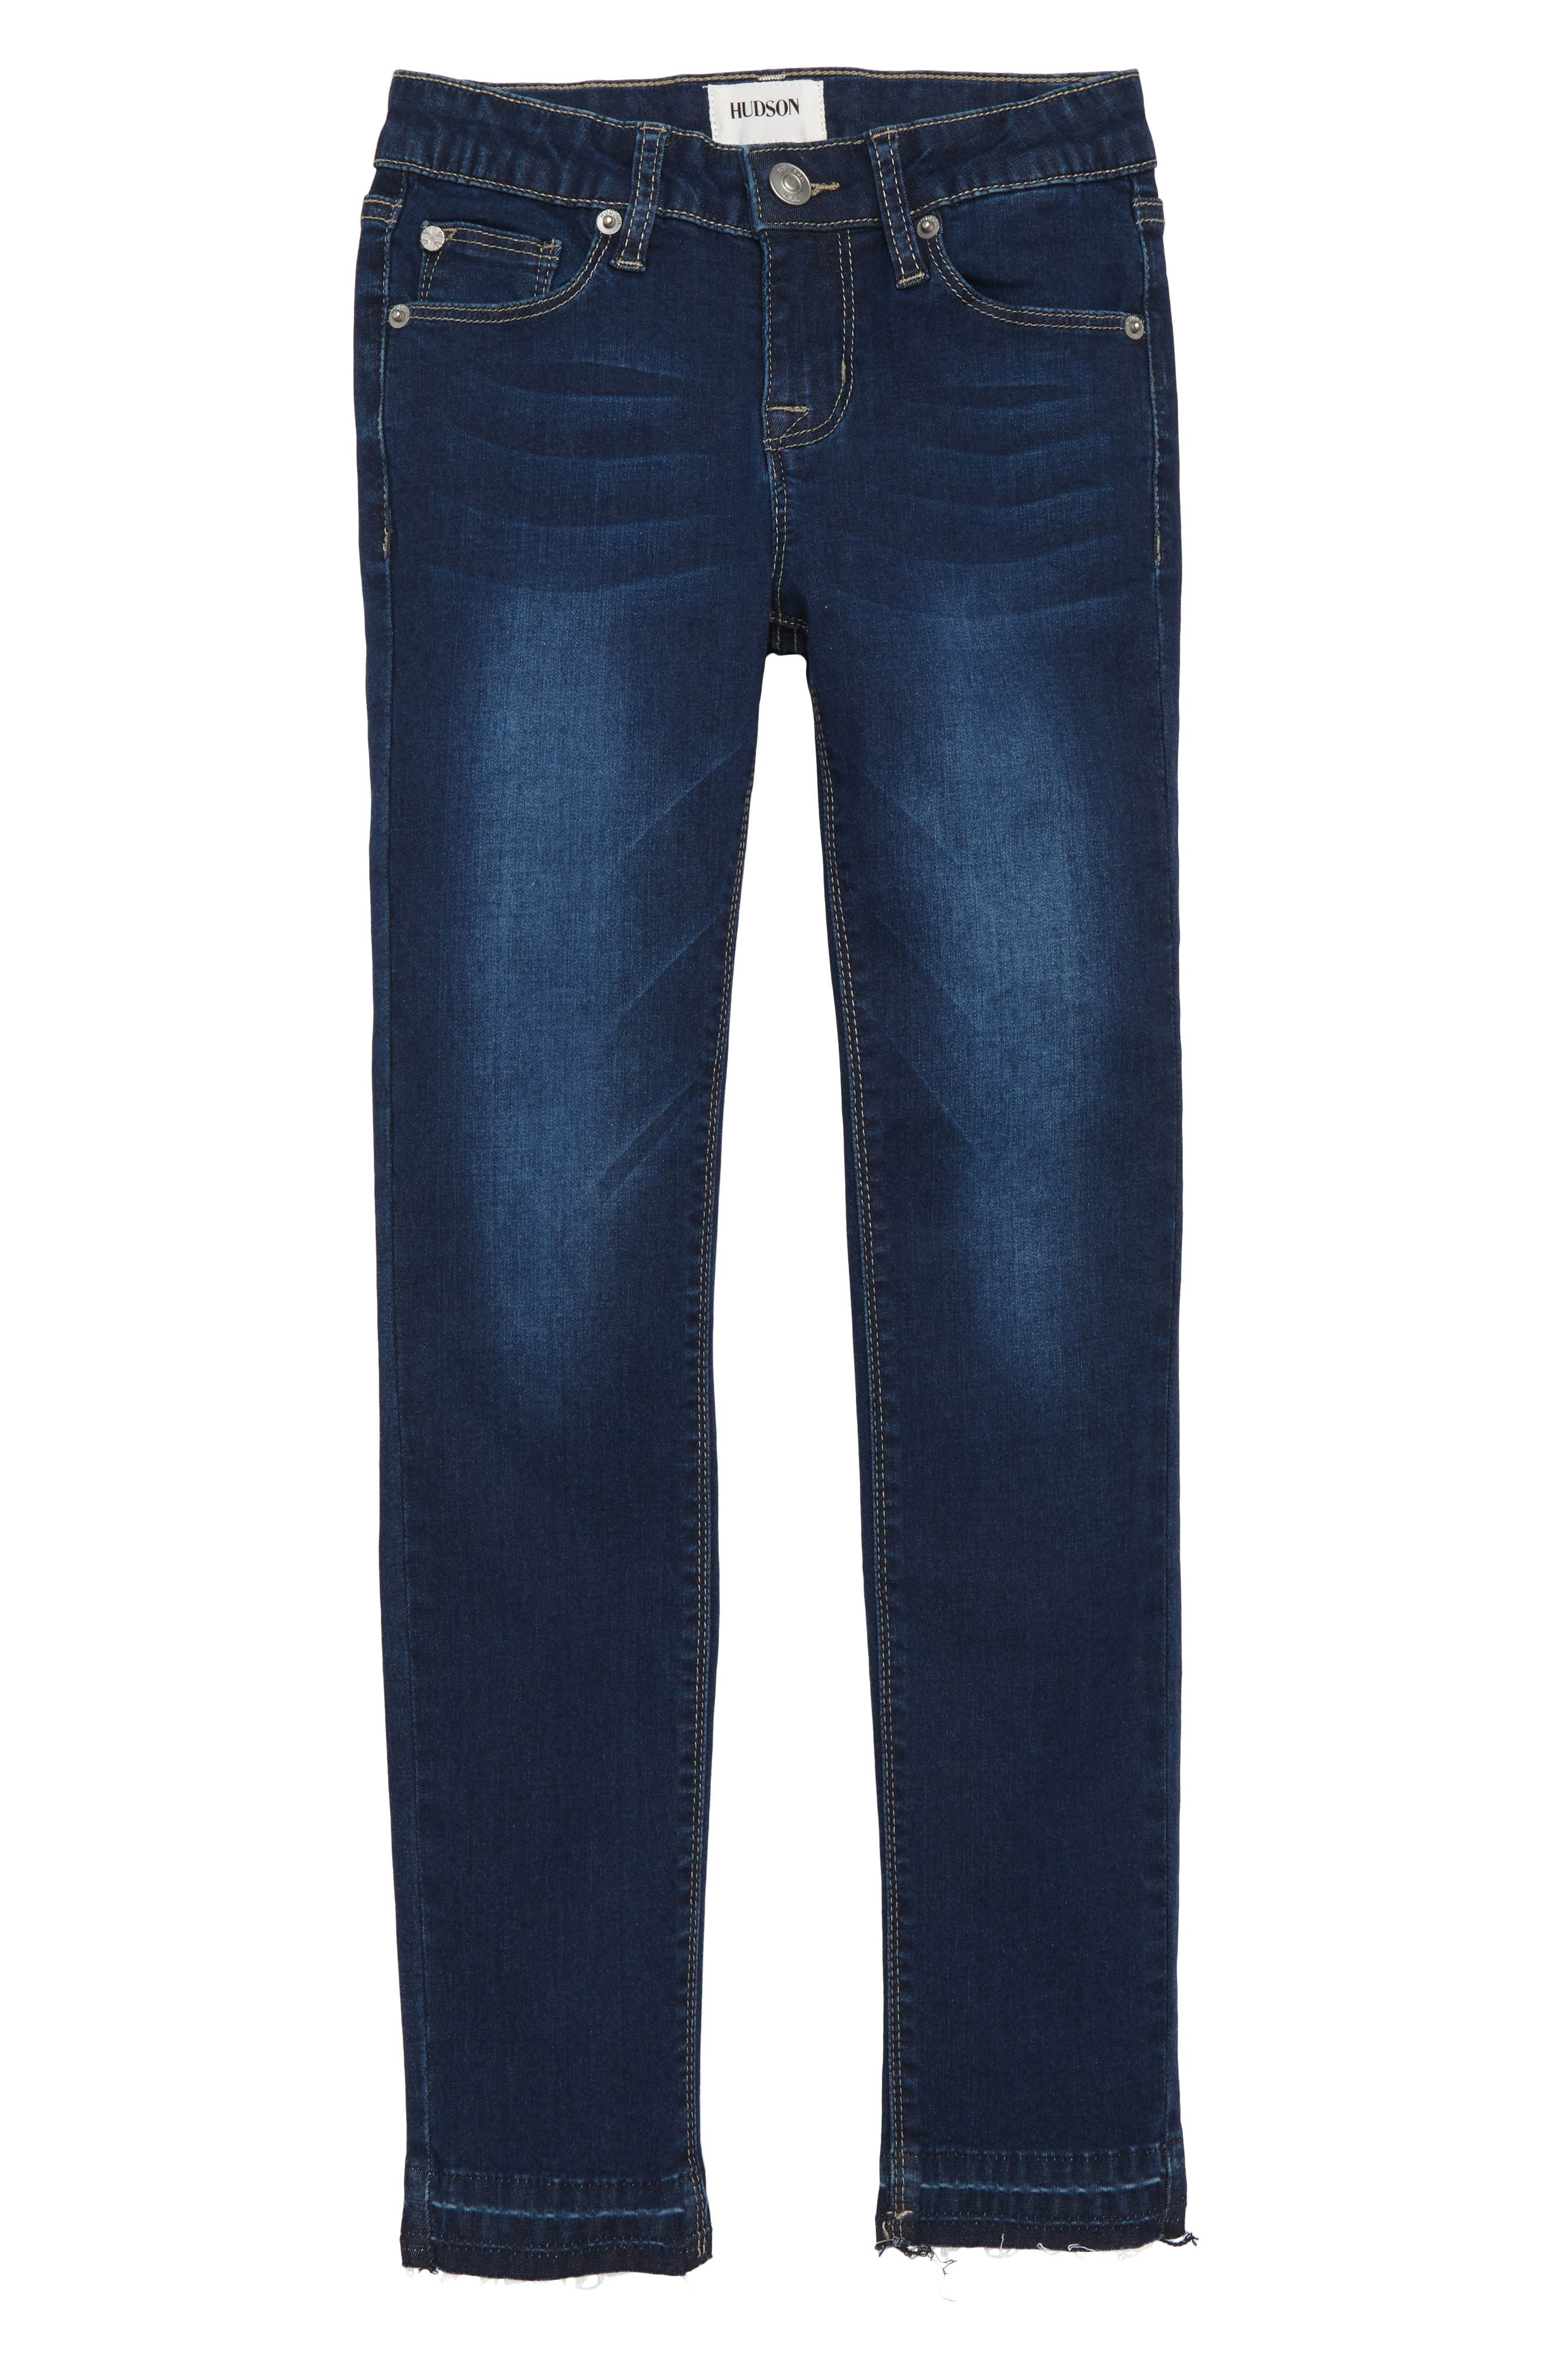 Christa Release Hem Skinny Jeans,                             Main thumbnail 1, color,                             GLEAM WASH